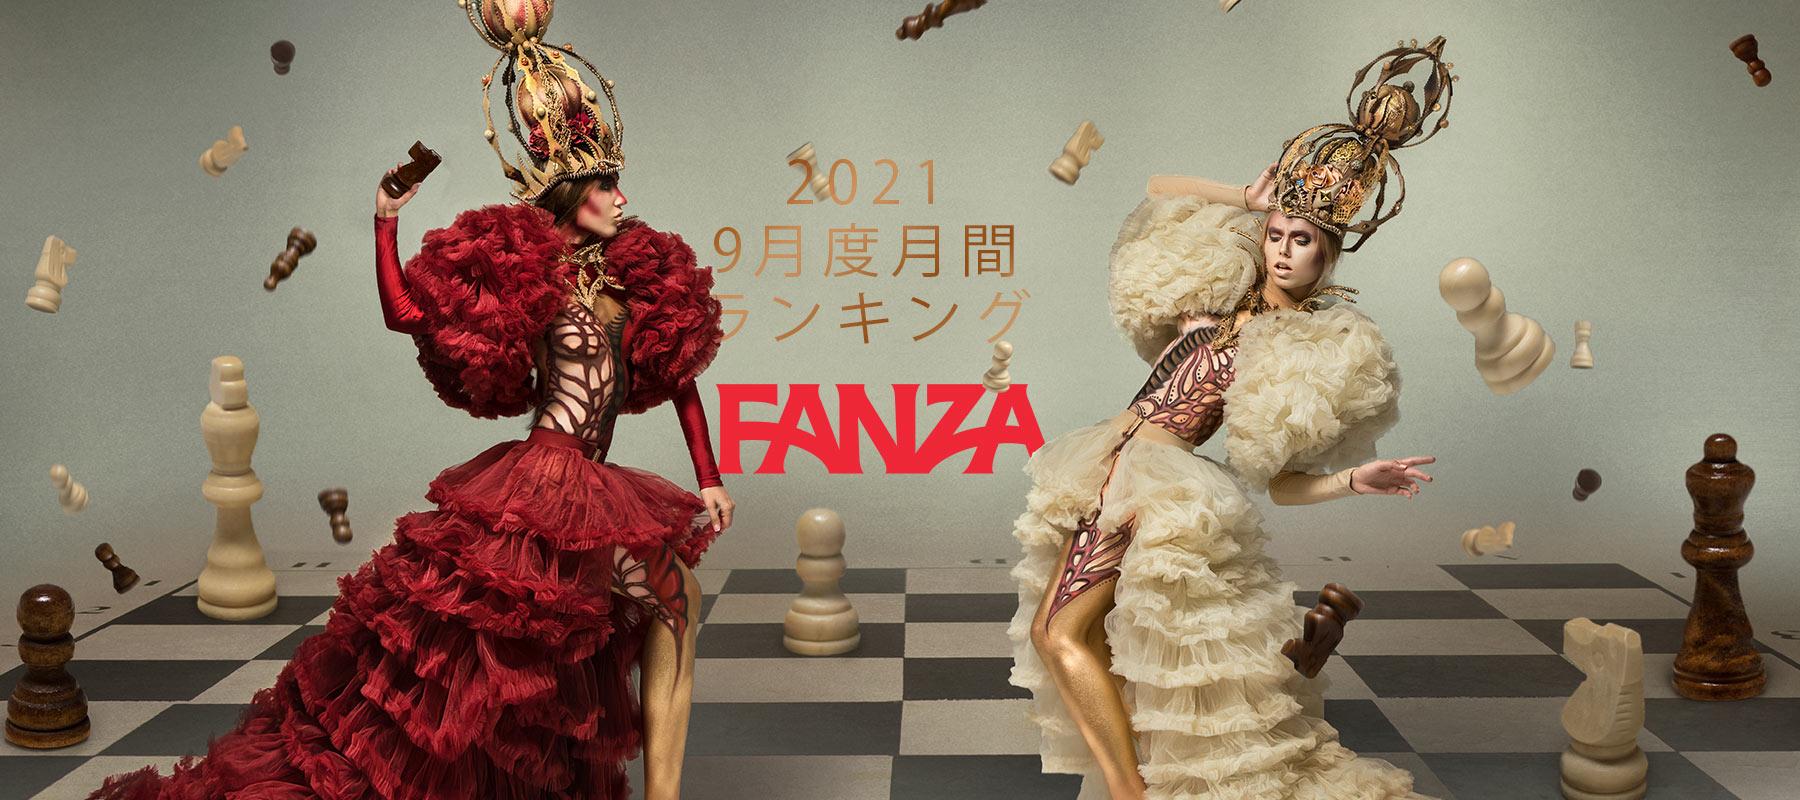 FANZA月間ランキング(2021年9月度)